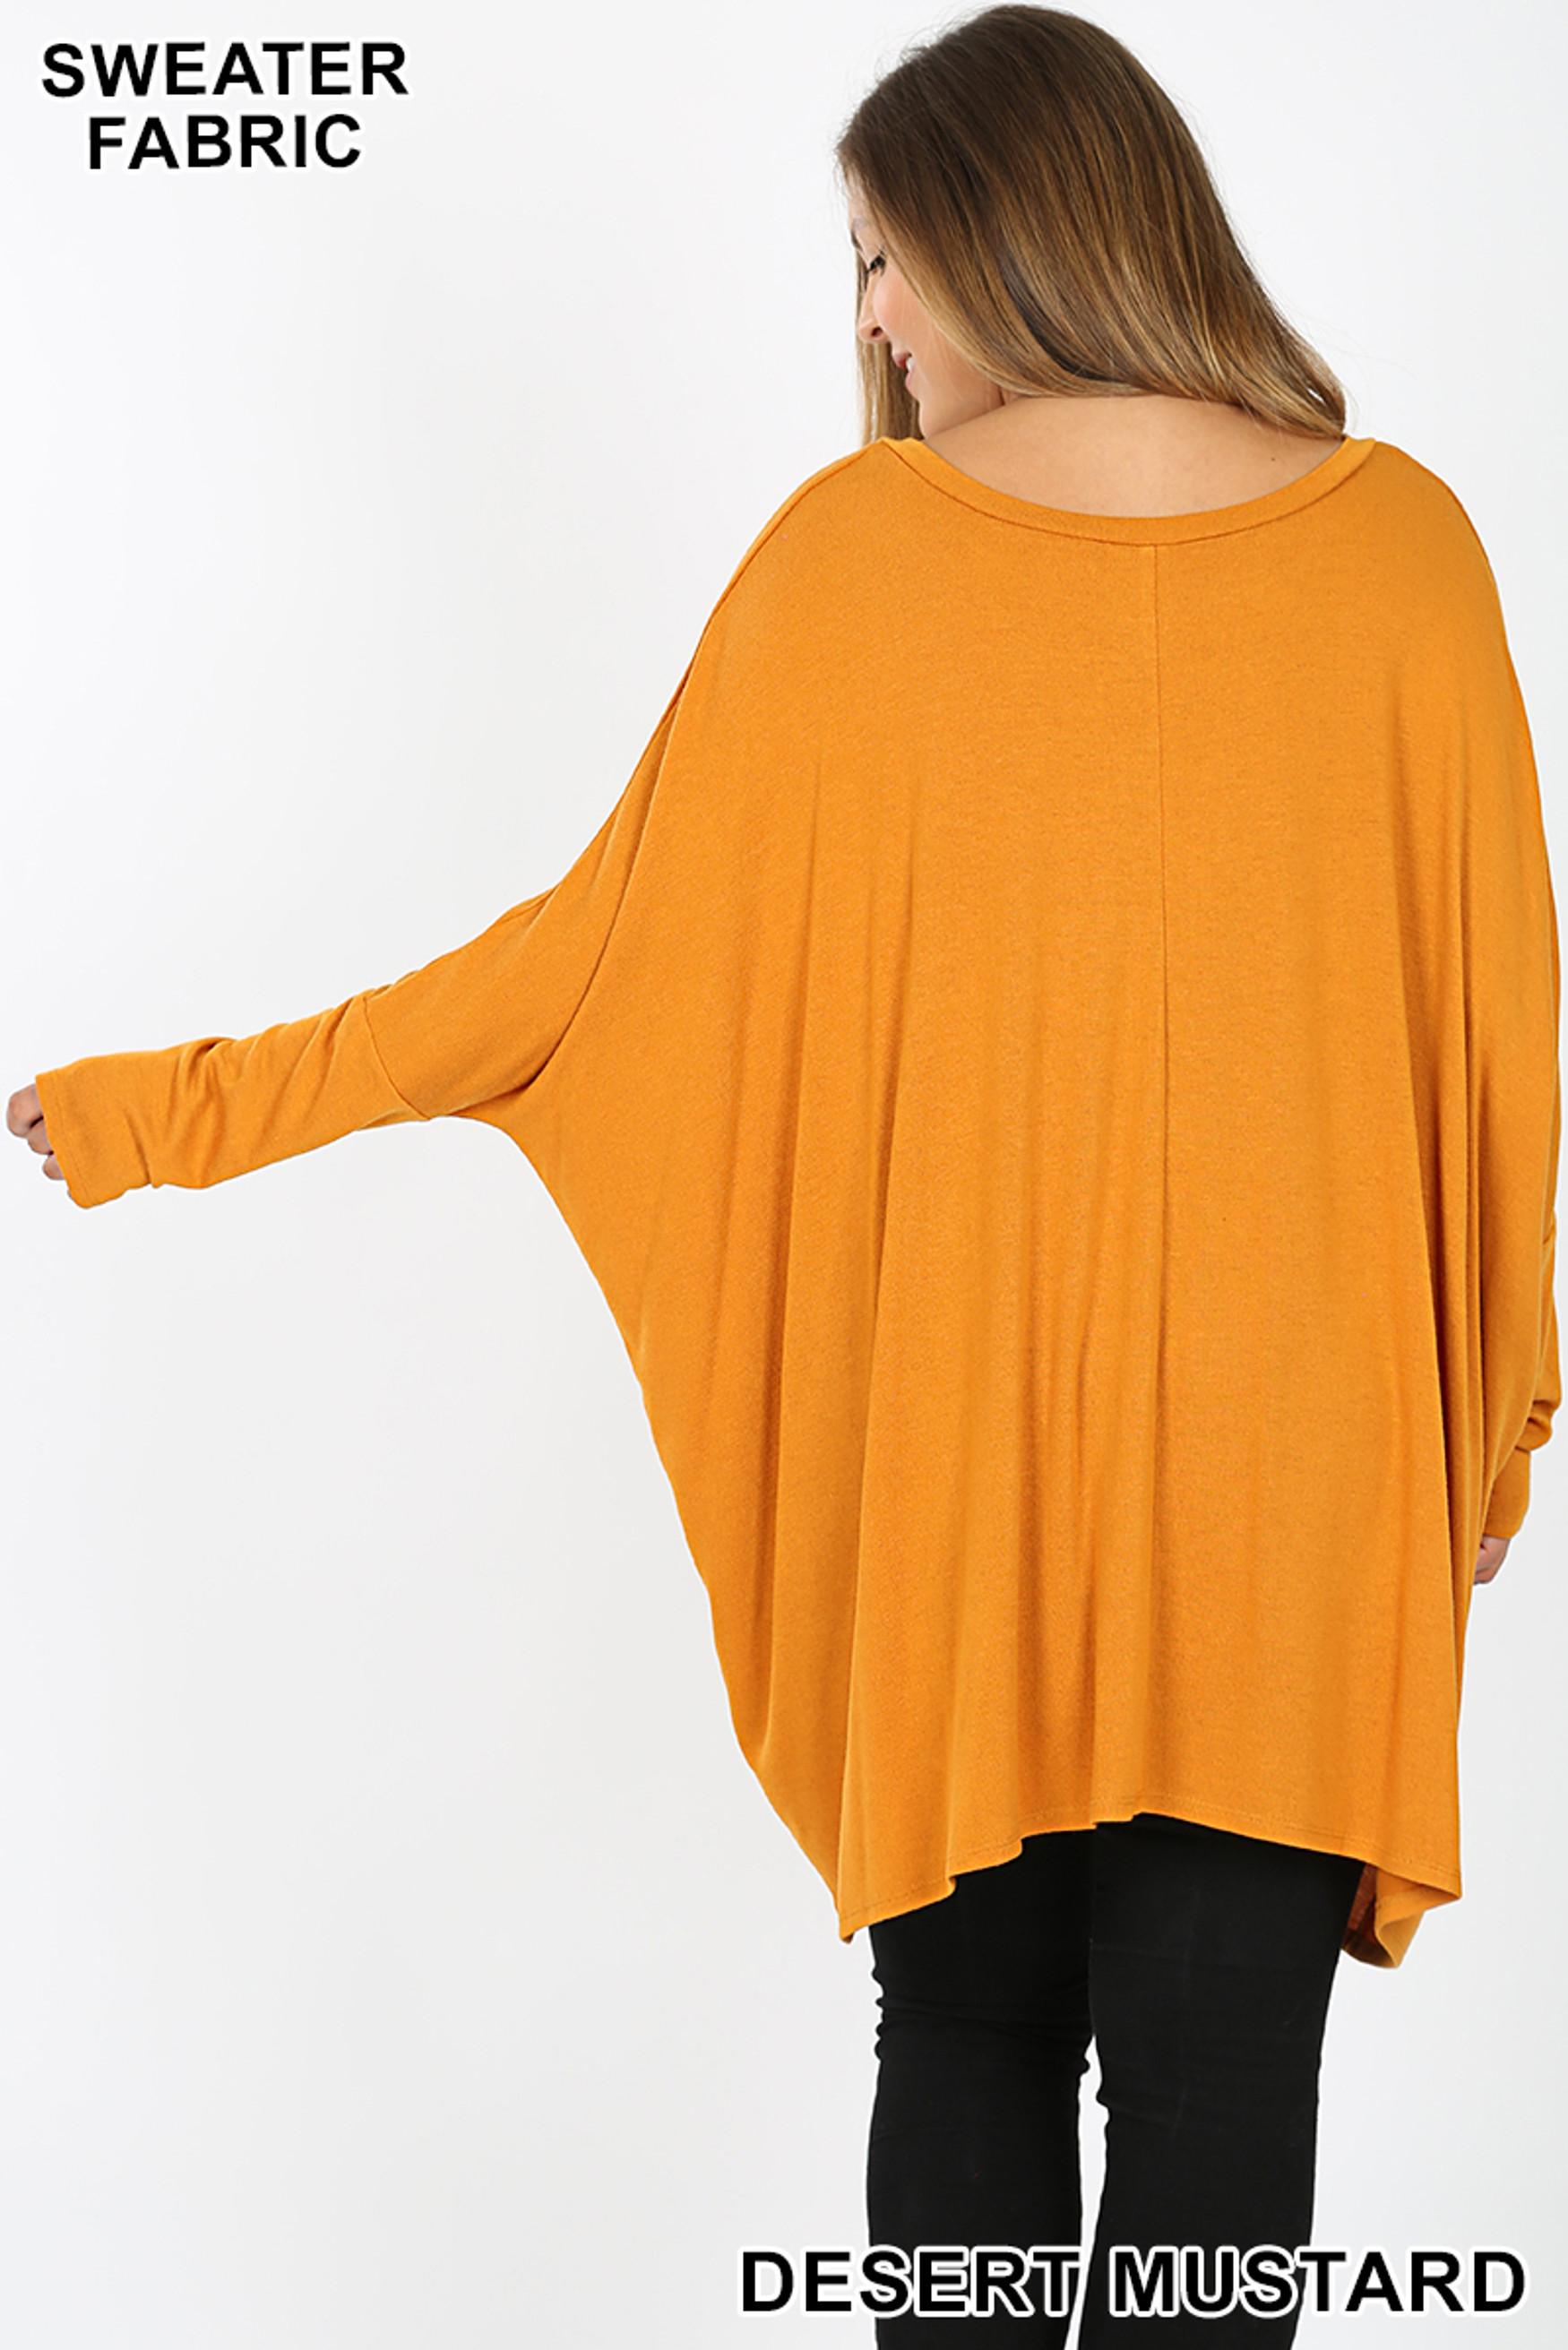 Back view image of Desert Mustard Oversized Round Neck Poncho Plus Size Sweater